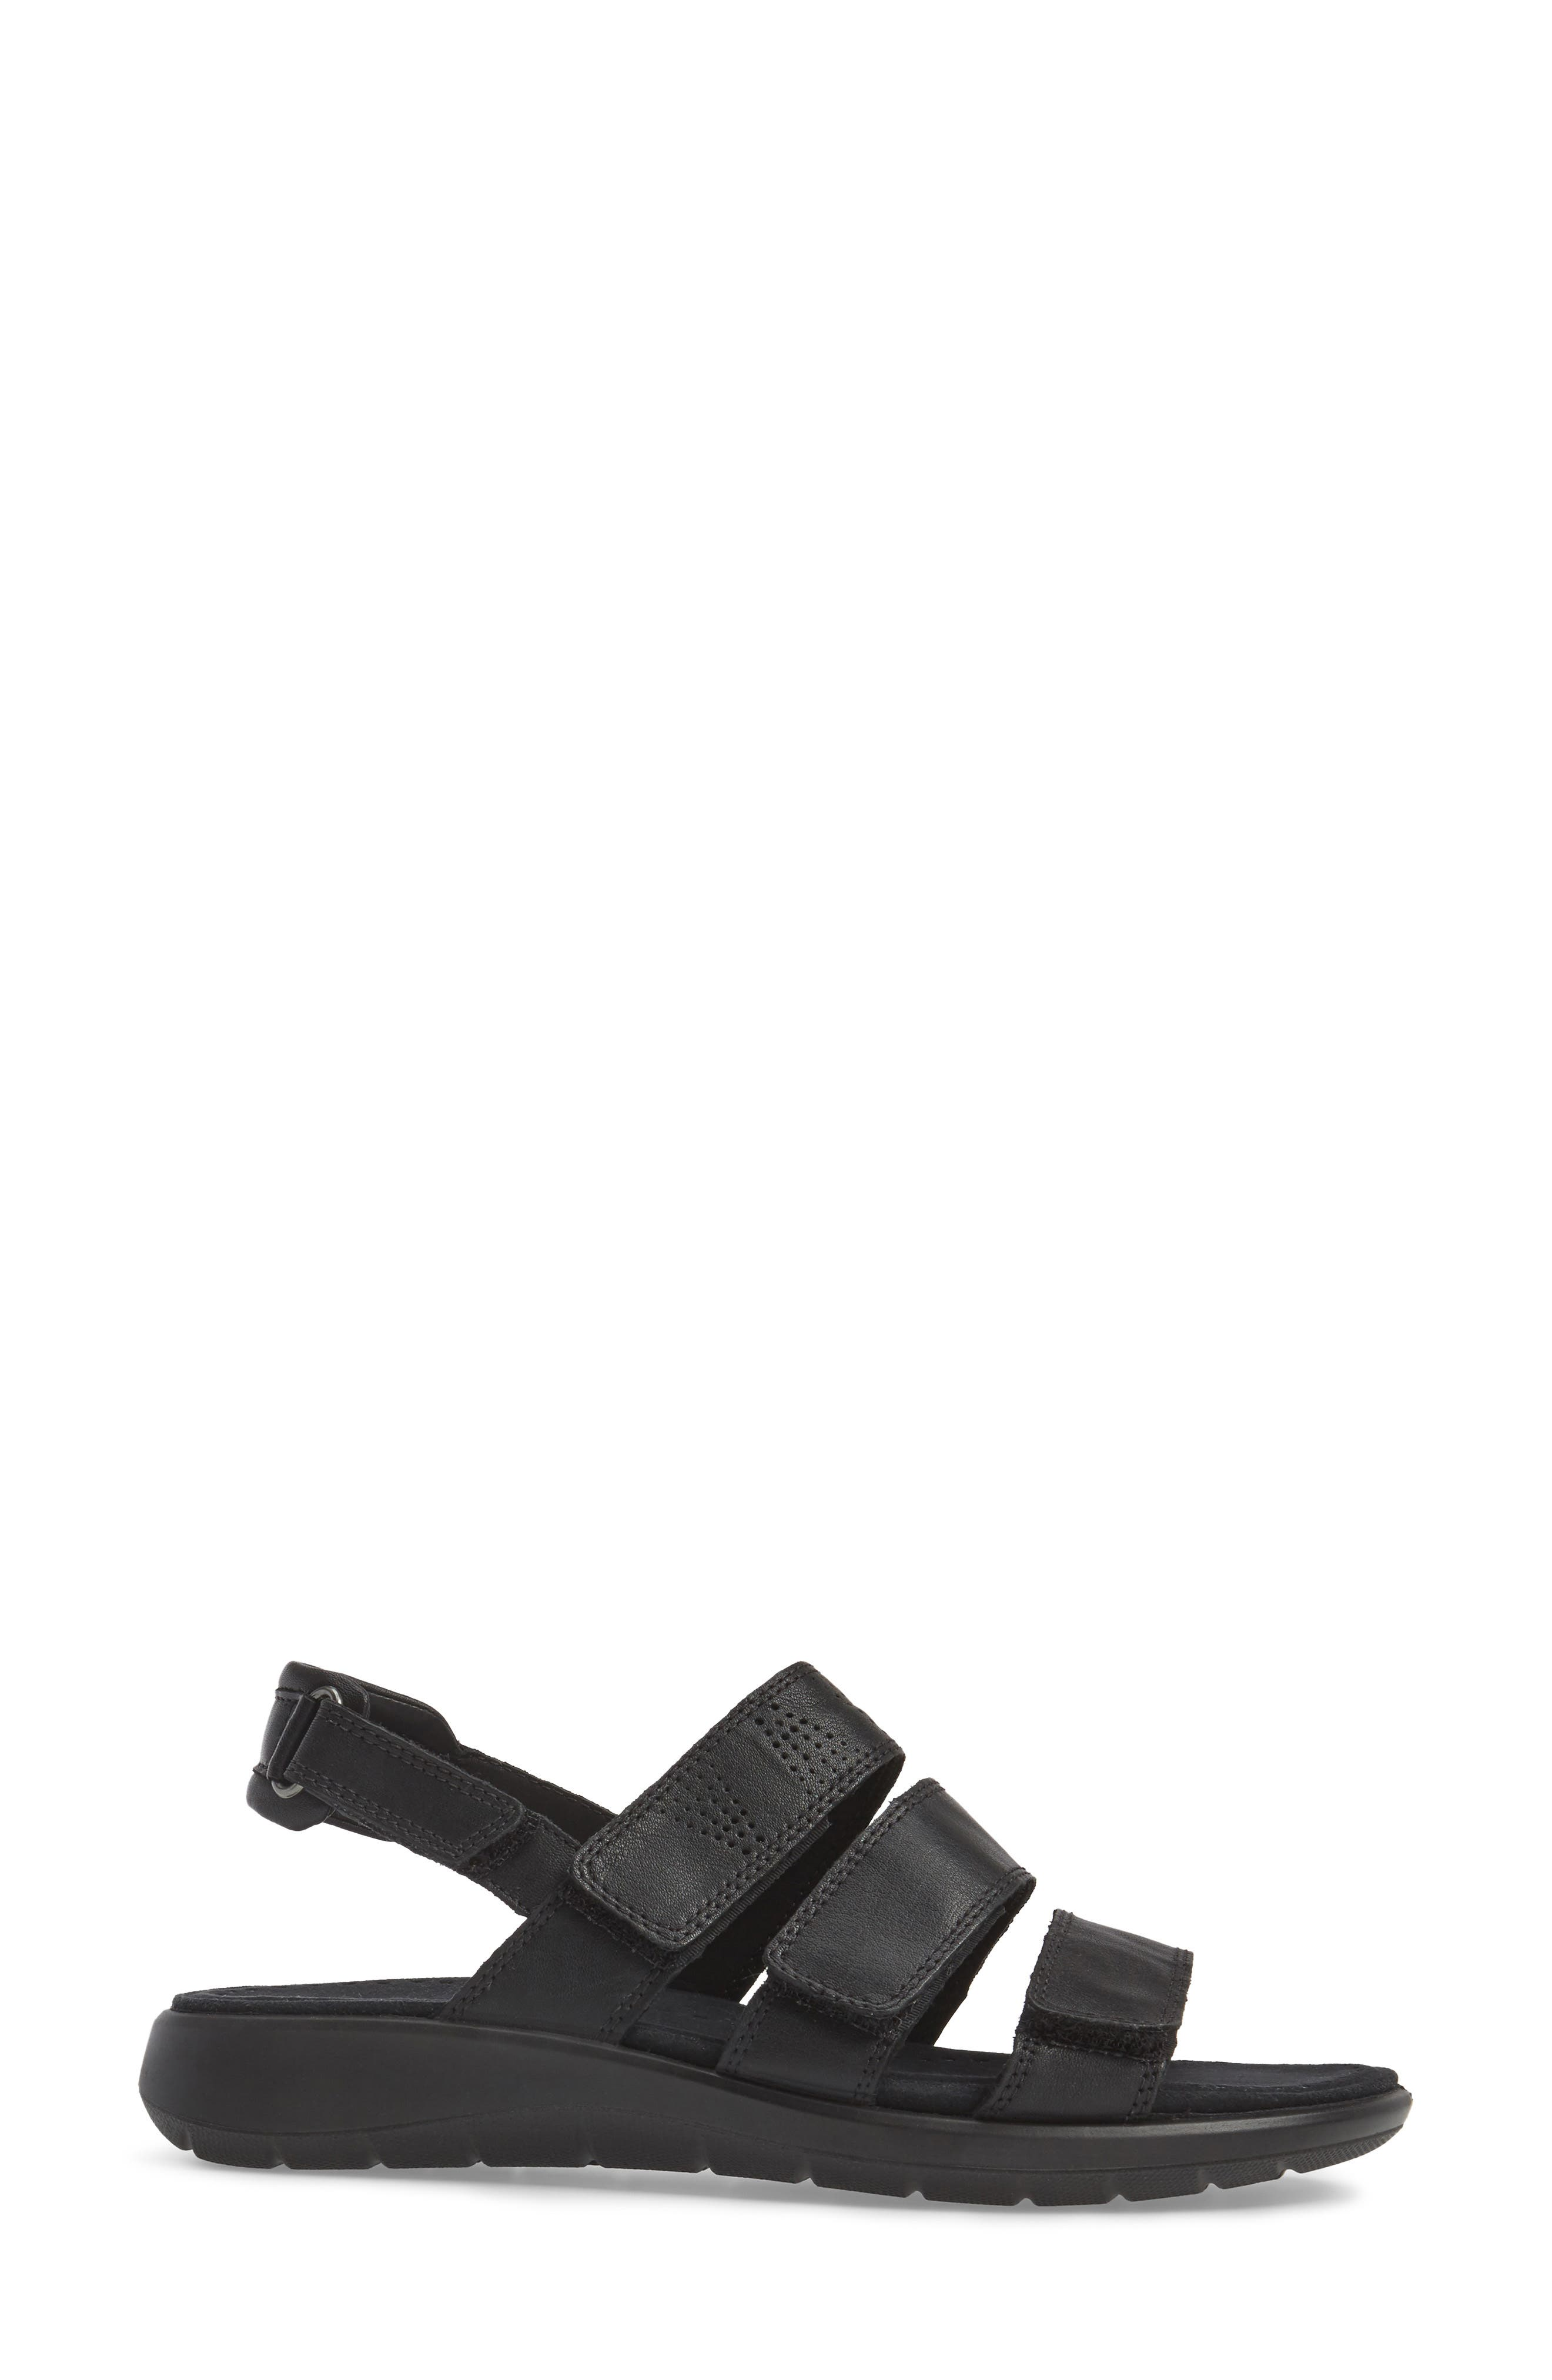 Soft 5 Sandal,                             Alternate thumbnail 8, color,